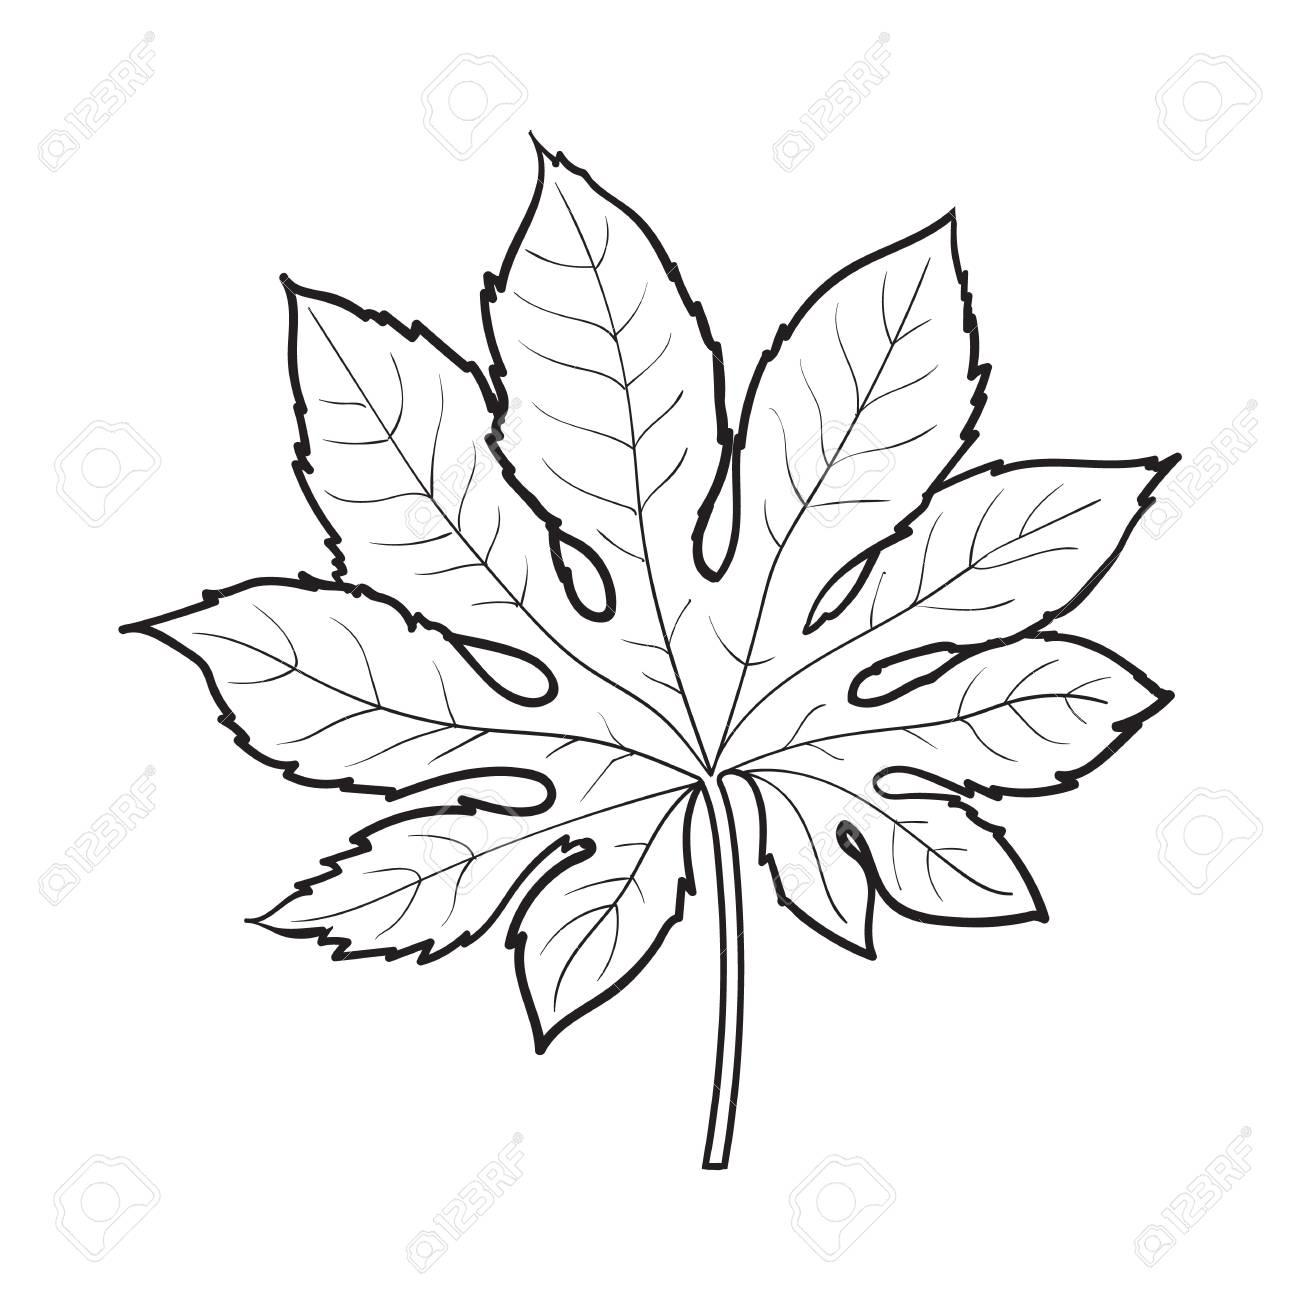 1300x1300 Full Fresh Leaf Of Fatsia Japonica Palm Tree, Sketch Style Vector